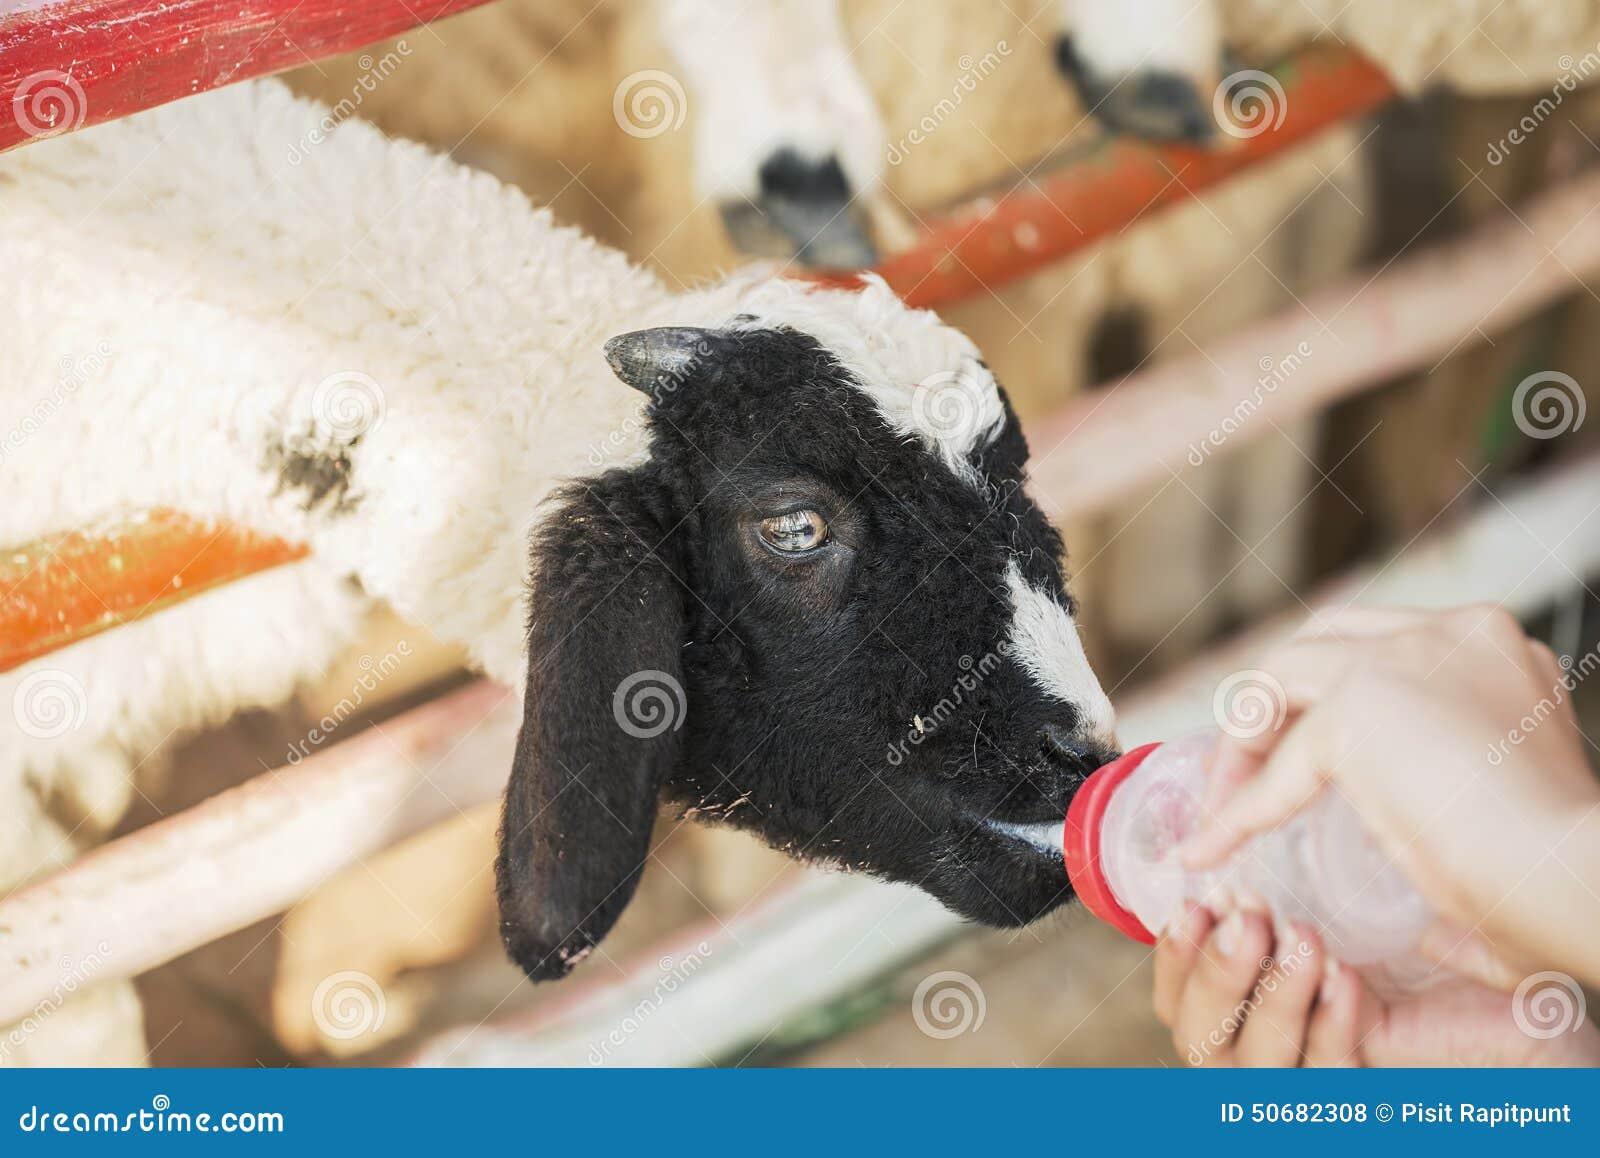 Download 在农场哄骗哺养的绵羊,泰国 库存照片. 图片 包括有 孩子, 结转, 逗人喜爱, 敌意, 地产, 农村, bothy - 50682308